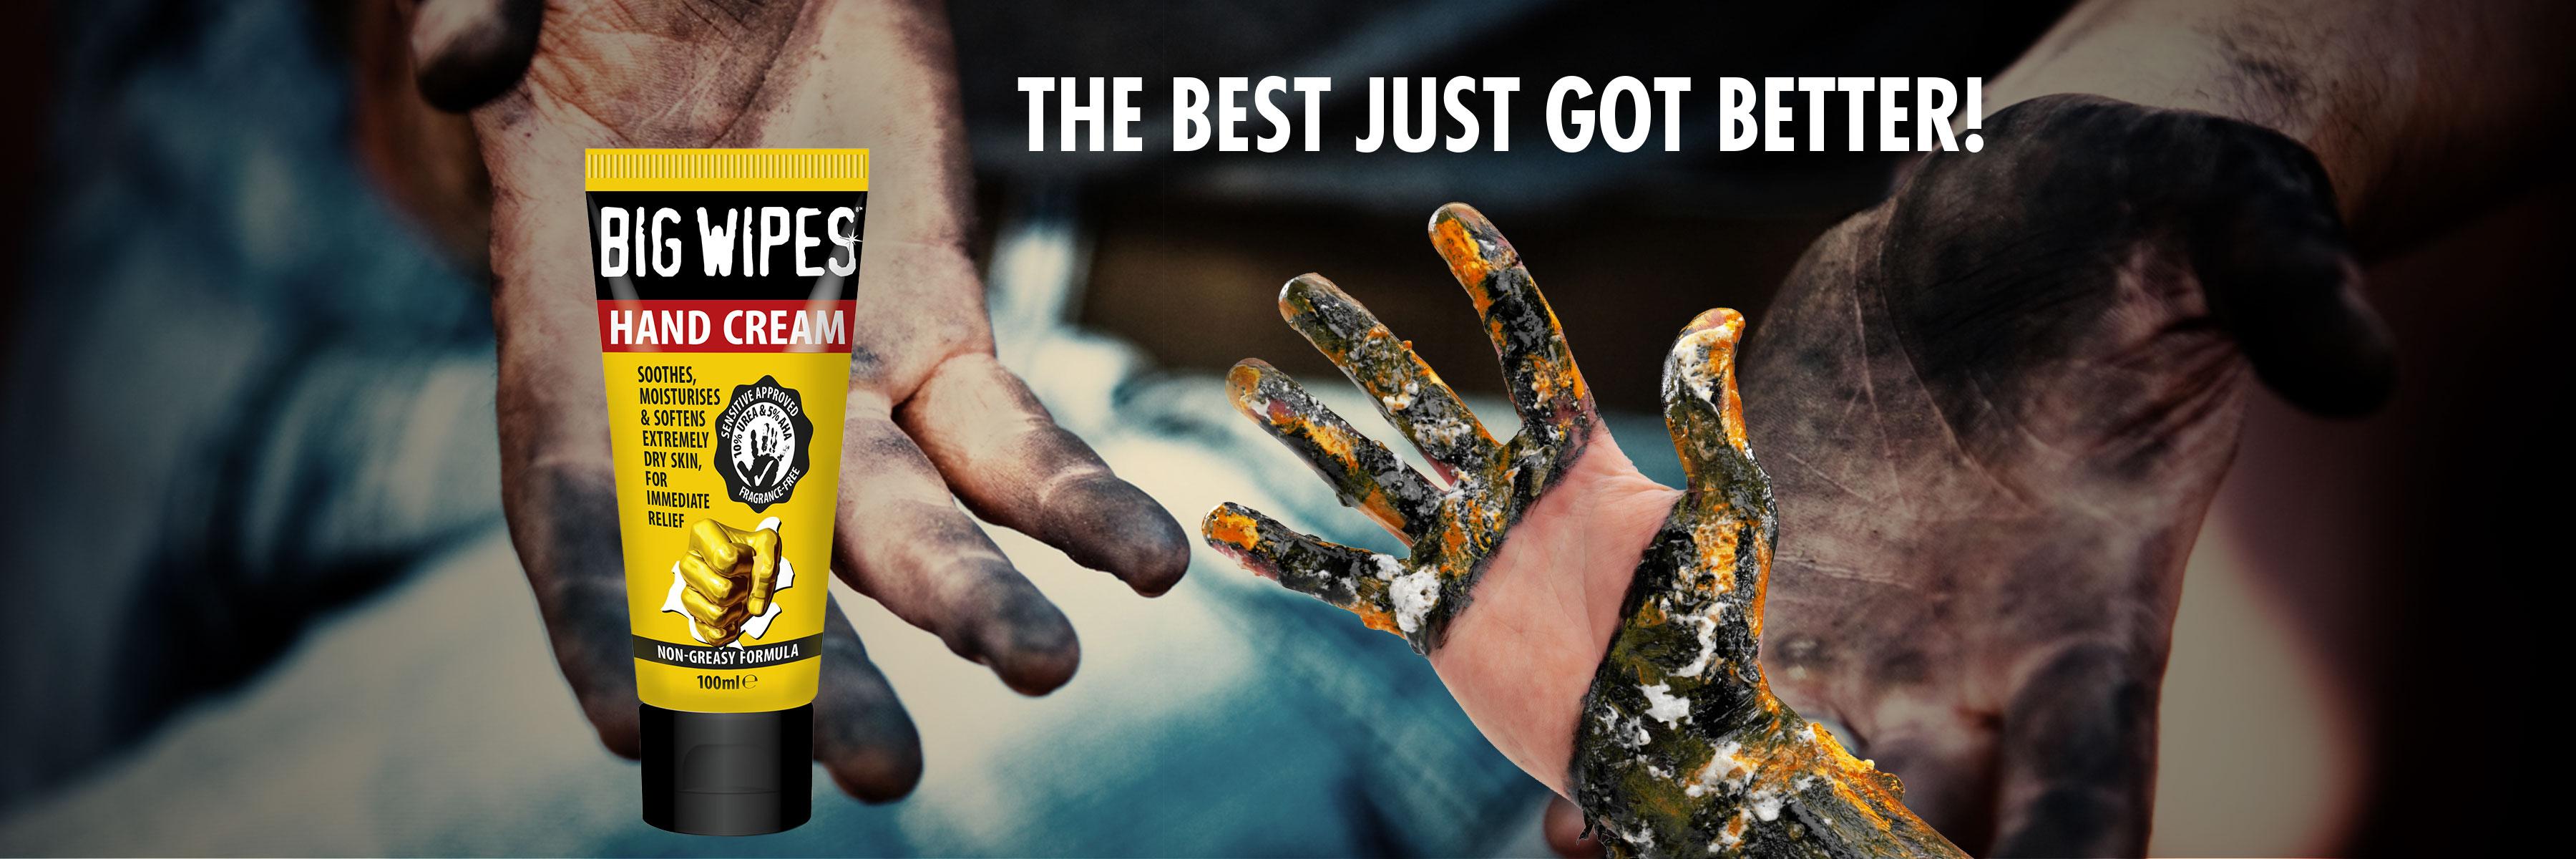 BIGWIPES - HAND CREAM - Industri PRO Rense håndcreme